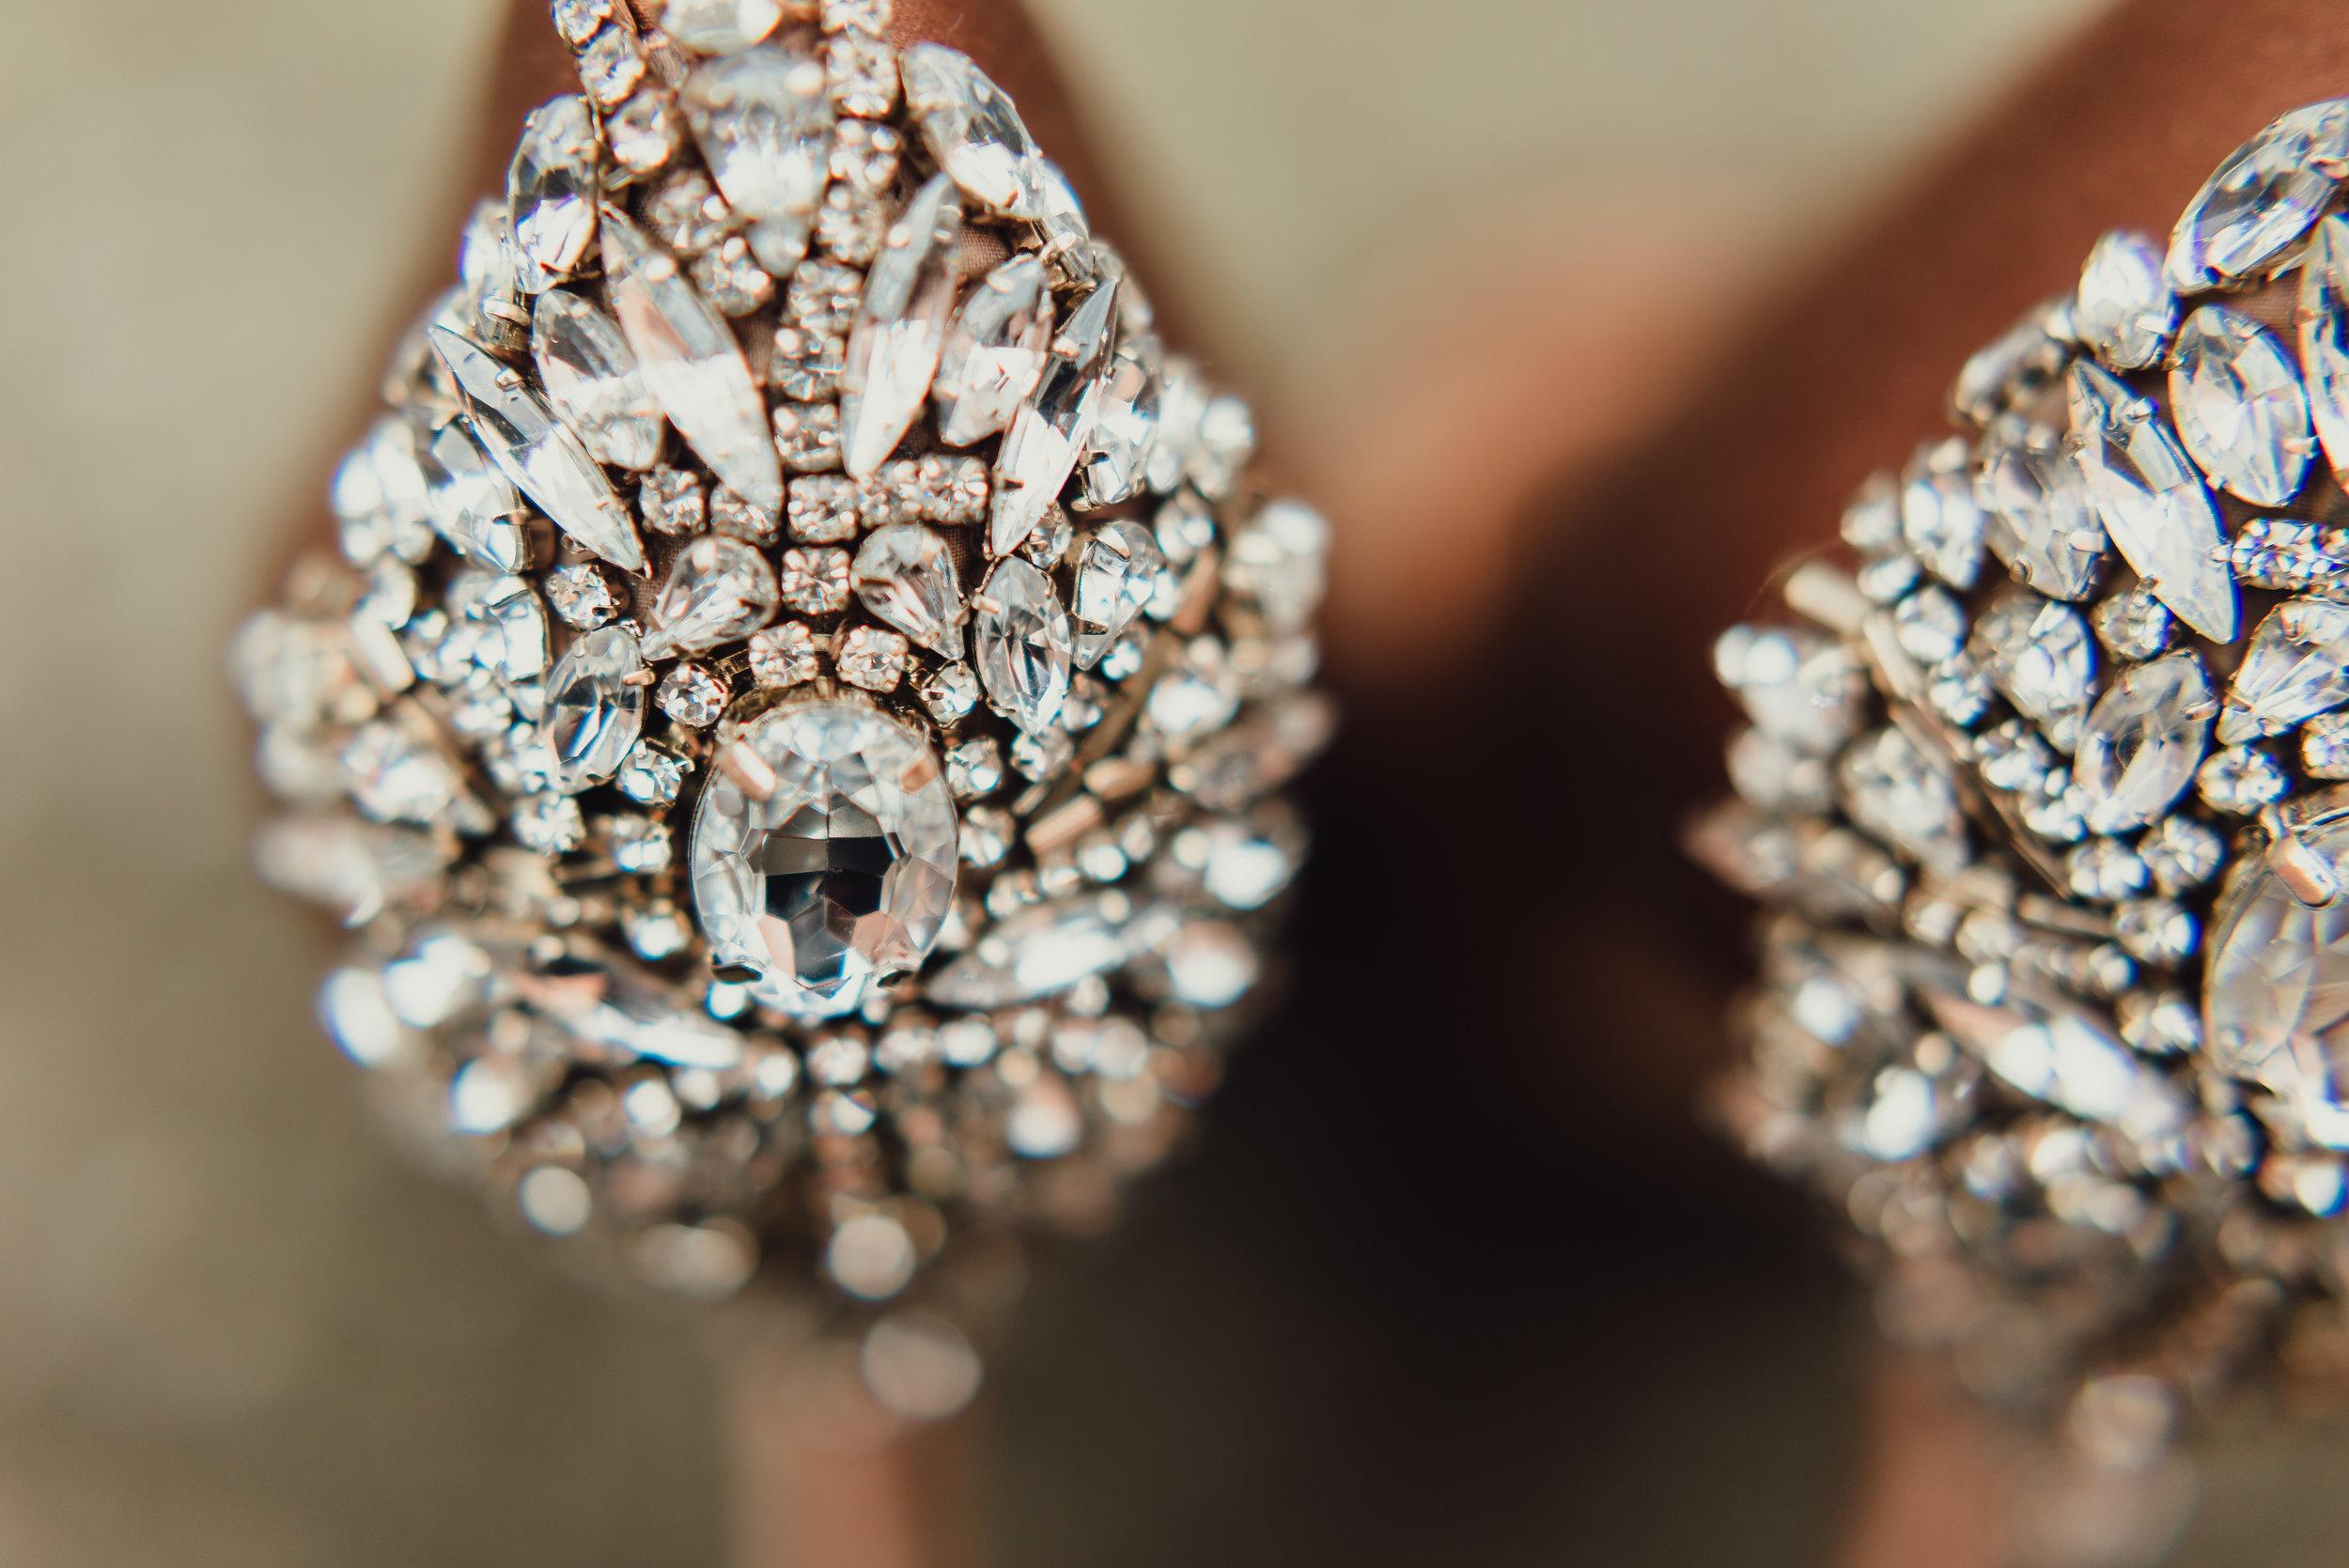 east-tn-wedding-photographer-tennessee-elopement-photographer-kingsport-tn-wedding-photographer (6 of 32).jpg